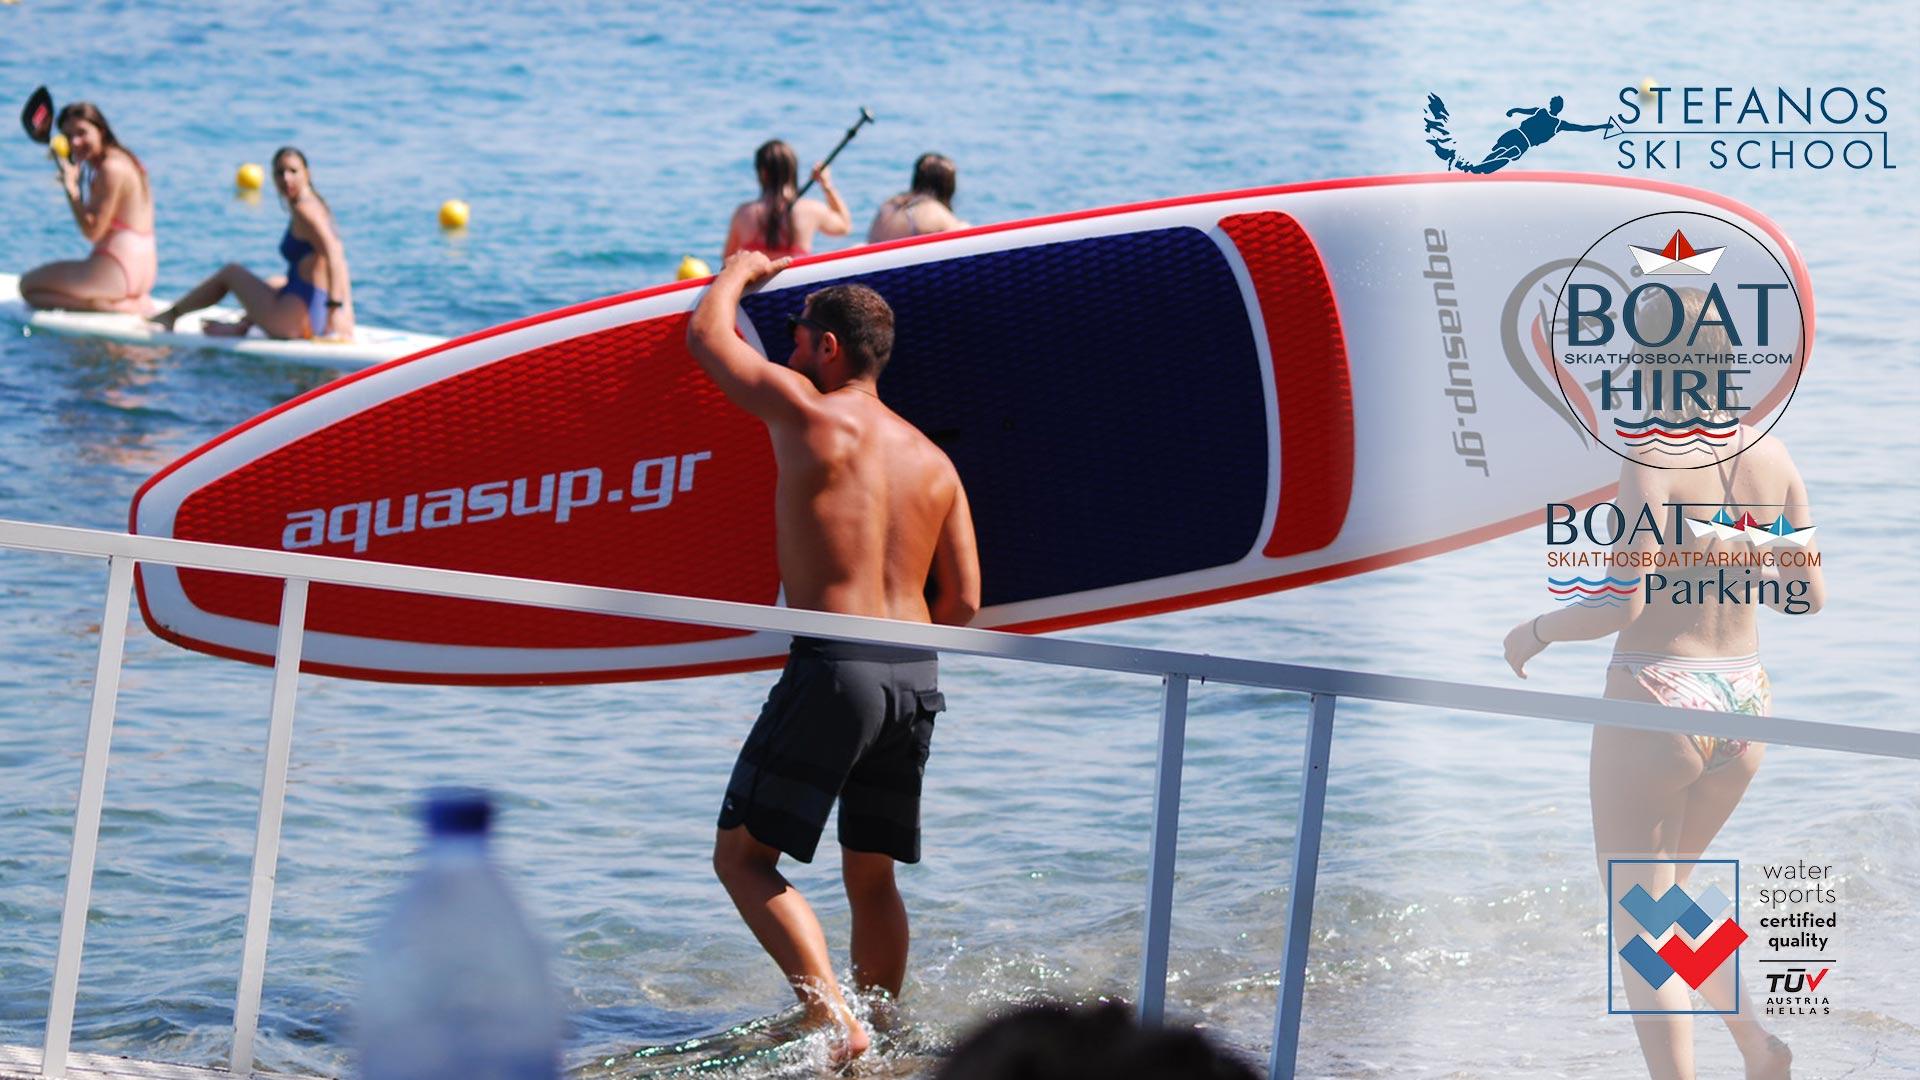 SUP Stand Up Paddle in Skiathos @stefanosskischool